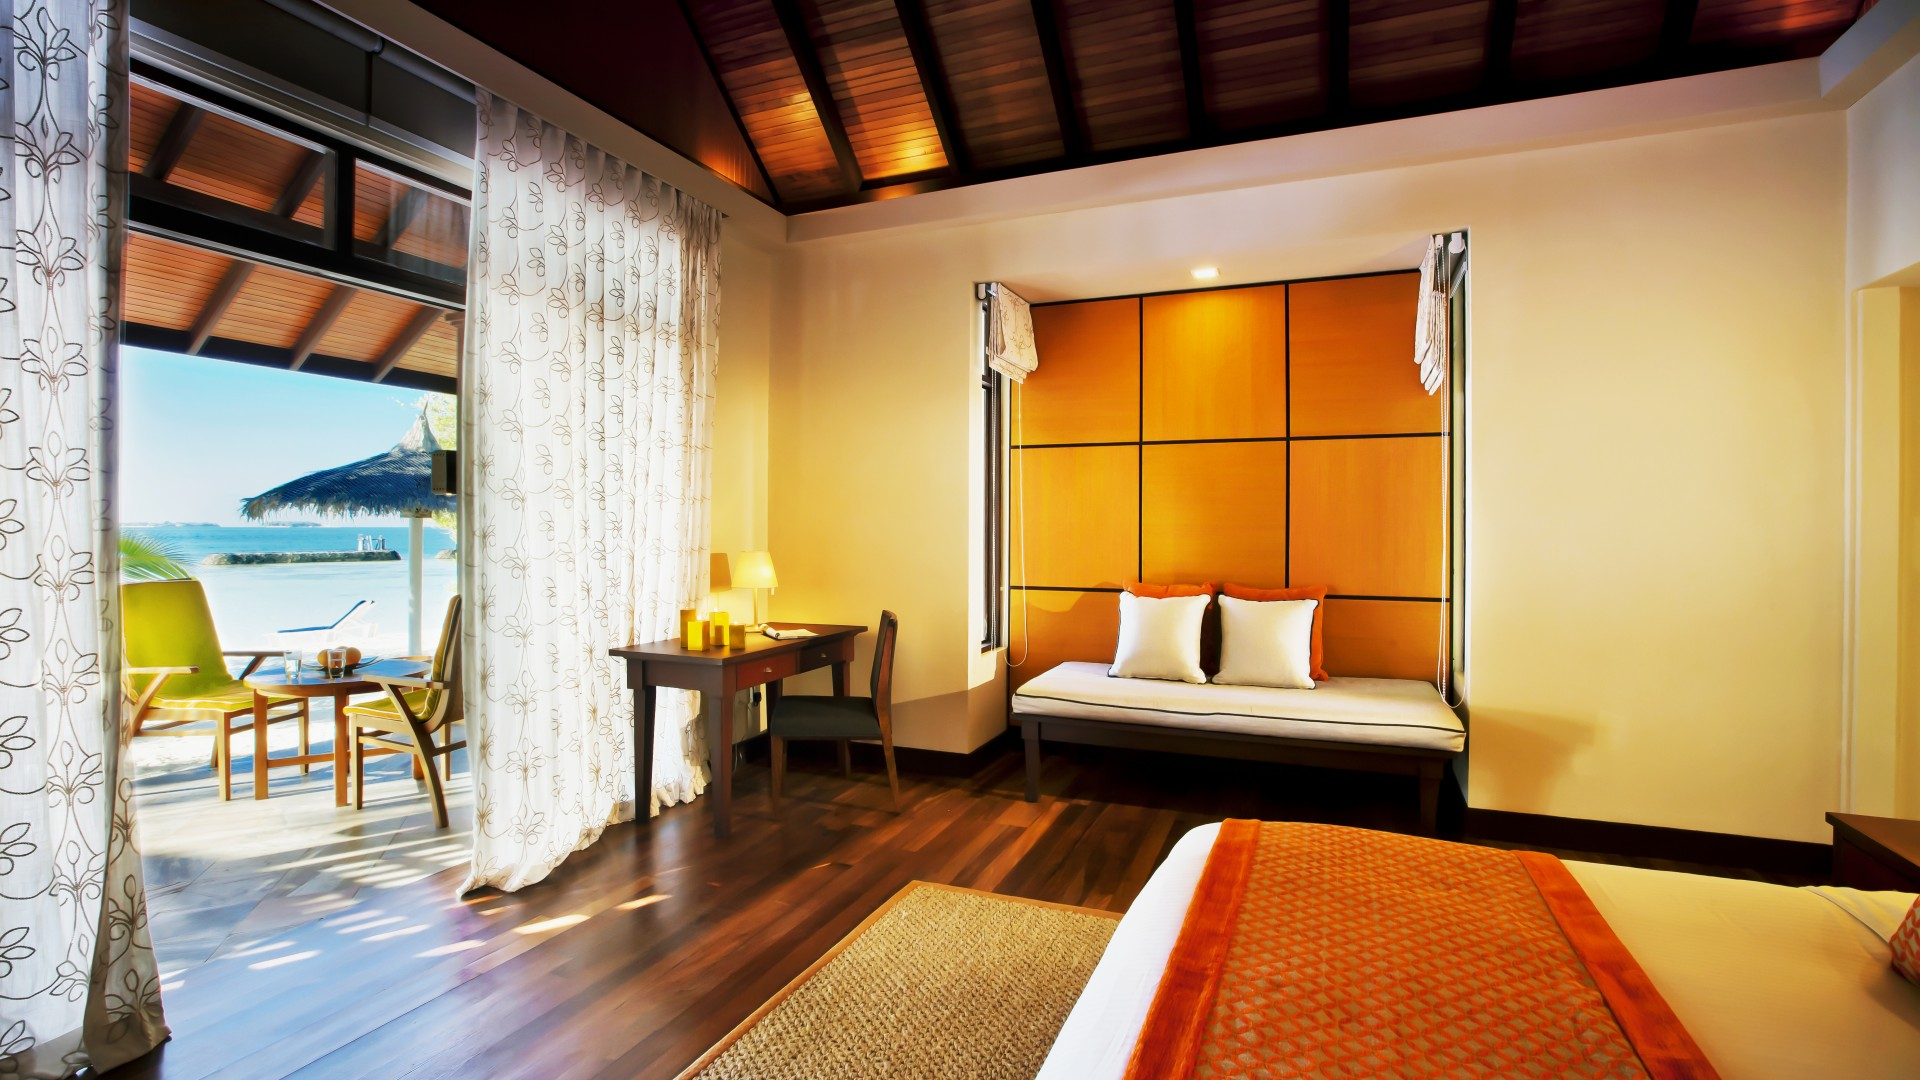 Wallpaper Kurumba Maldives Best Hotels Of 2015 Tourism